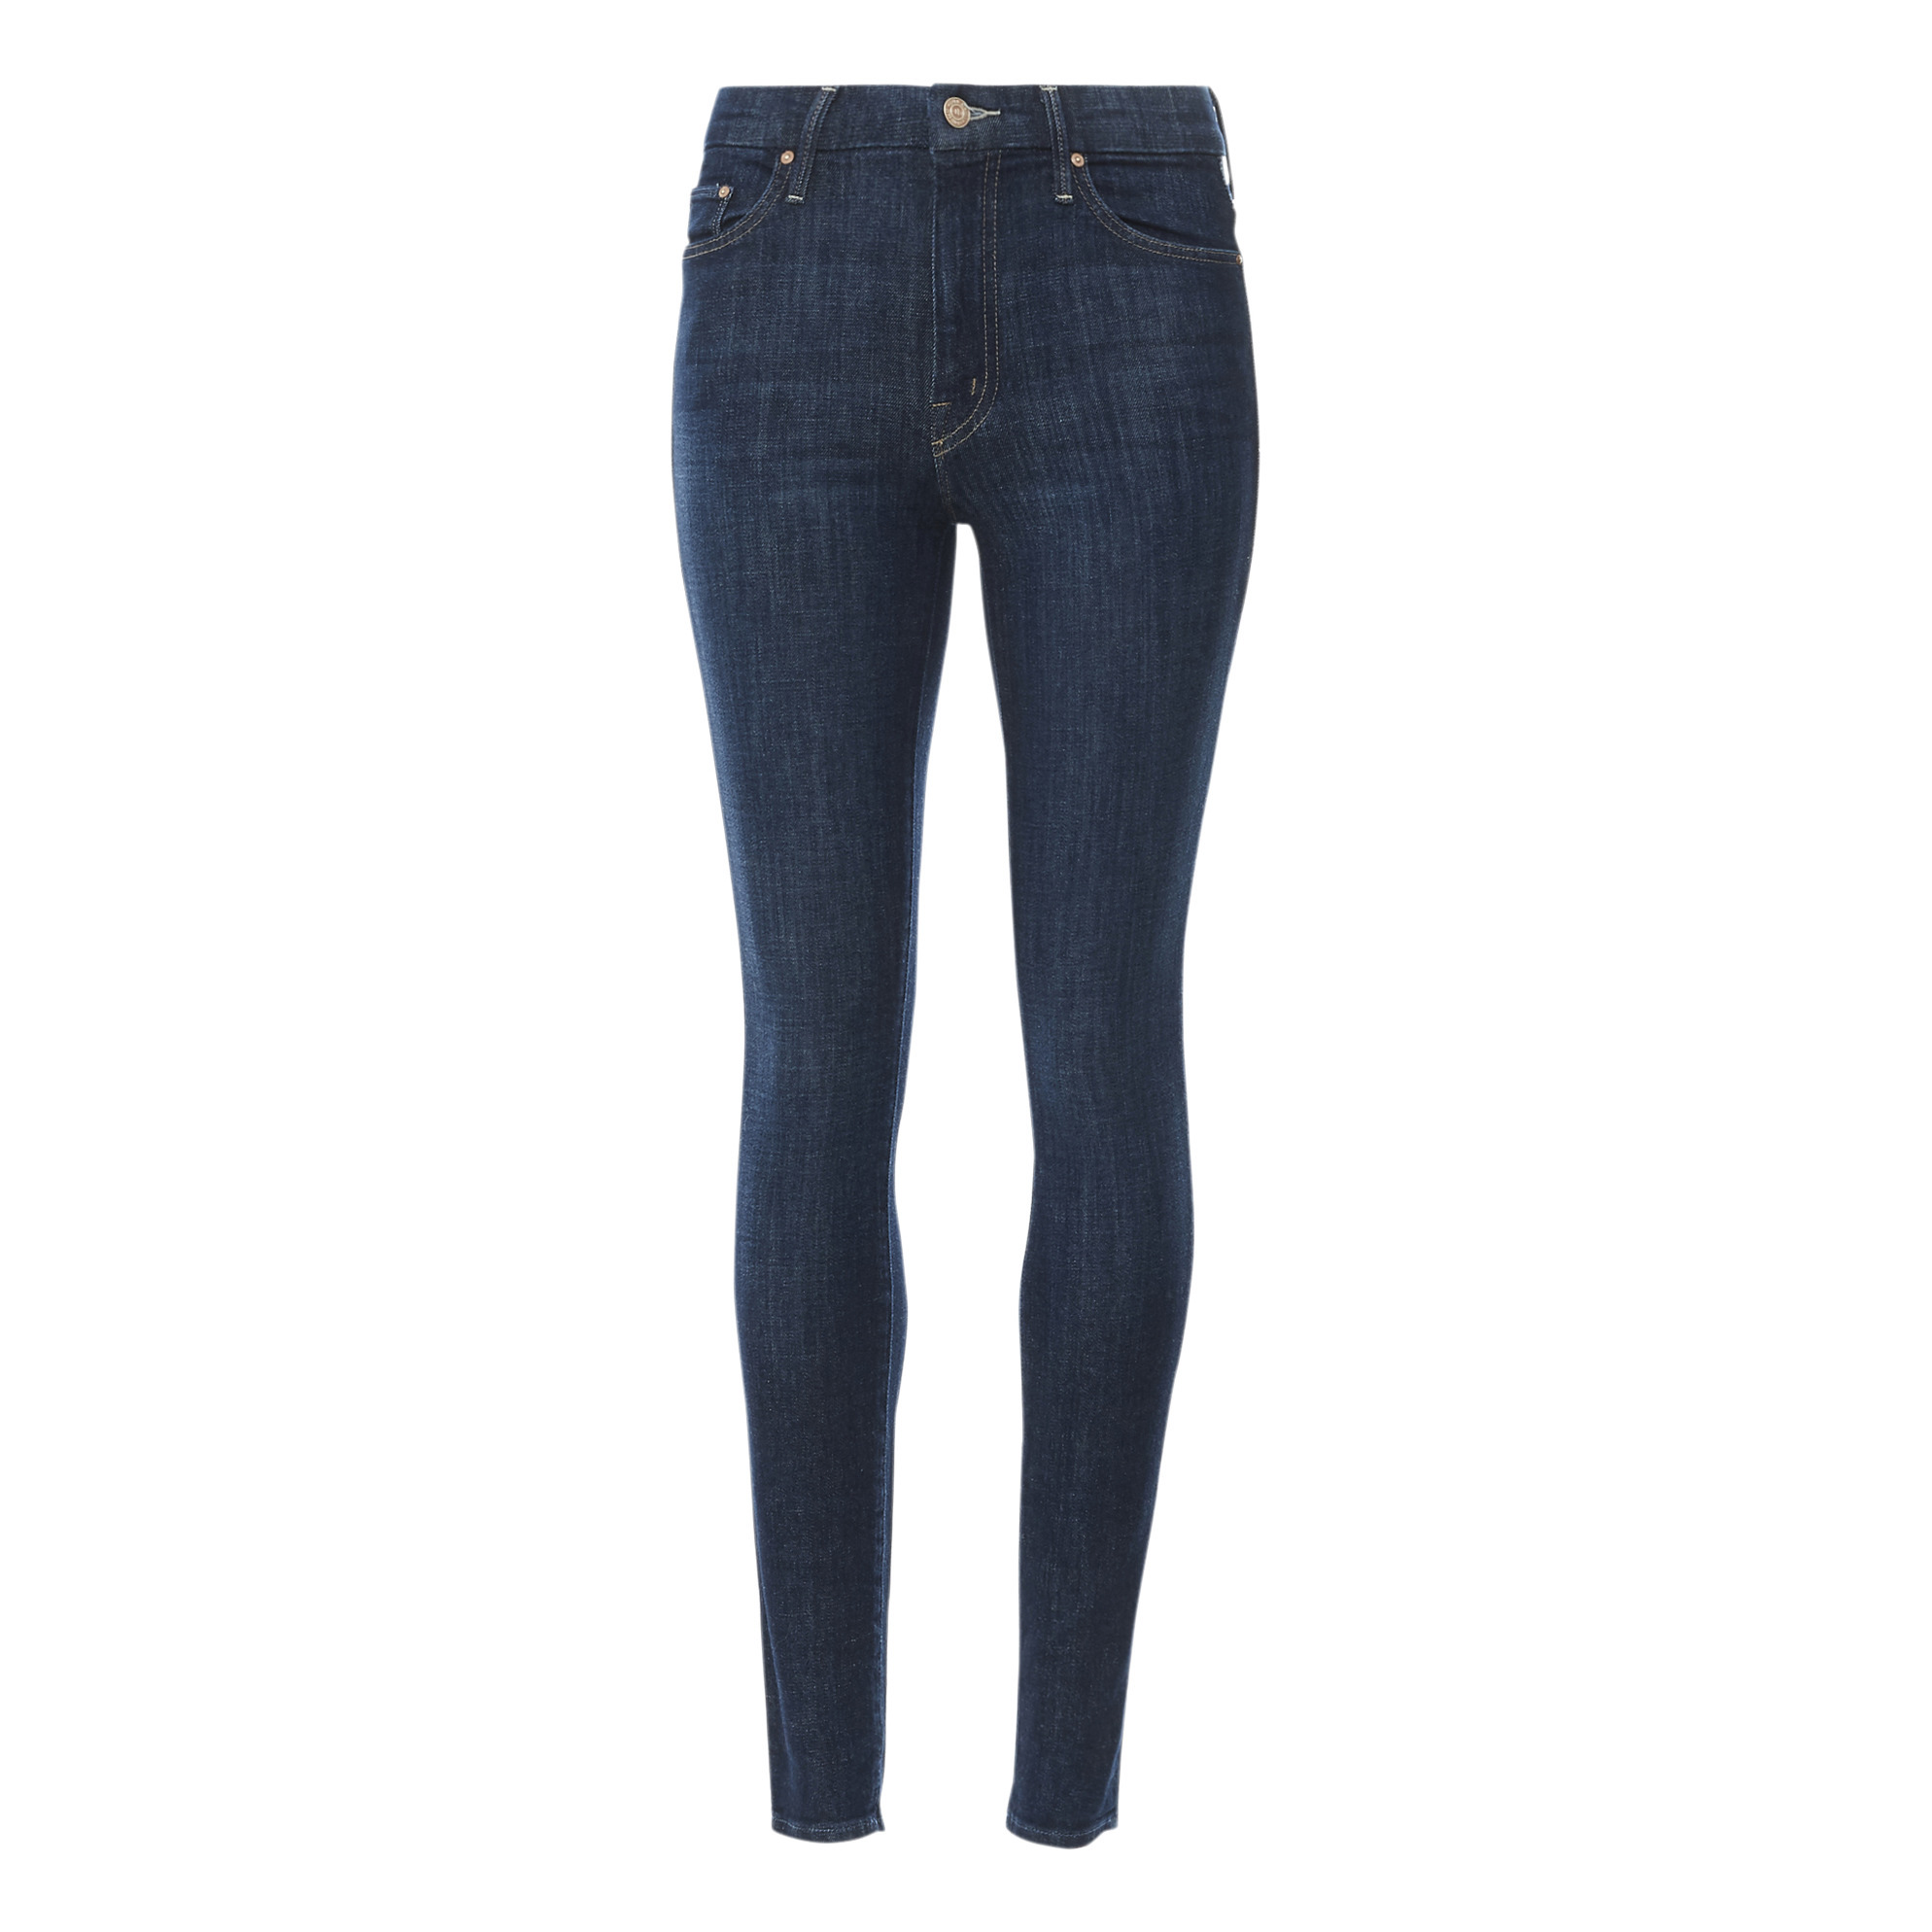 Ganz klar: Jeans Skinny The High Waisted Looker Hit